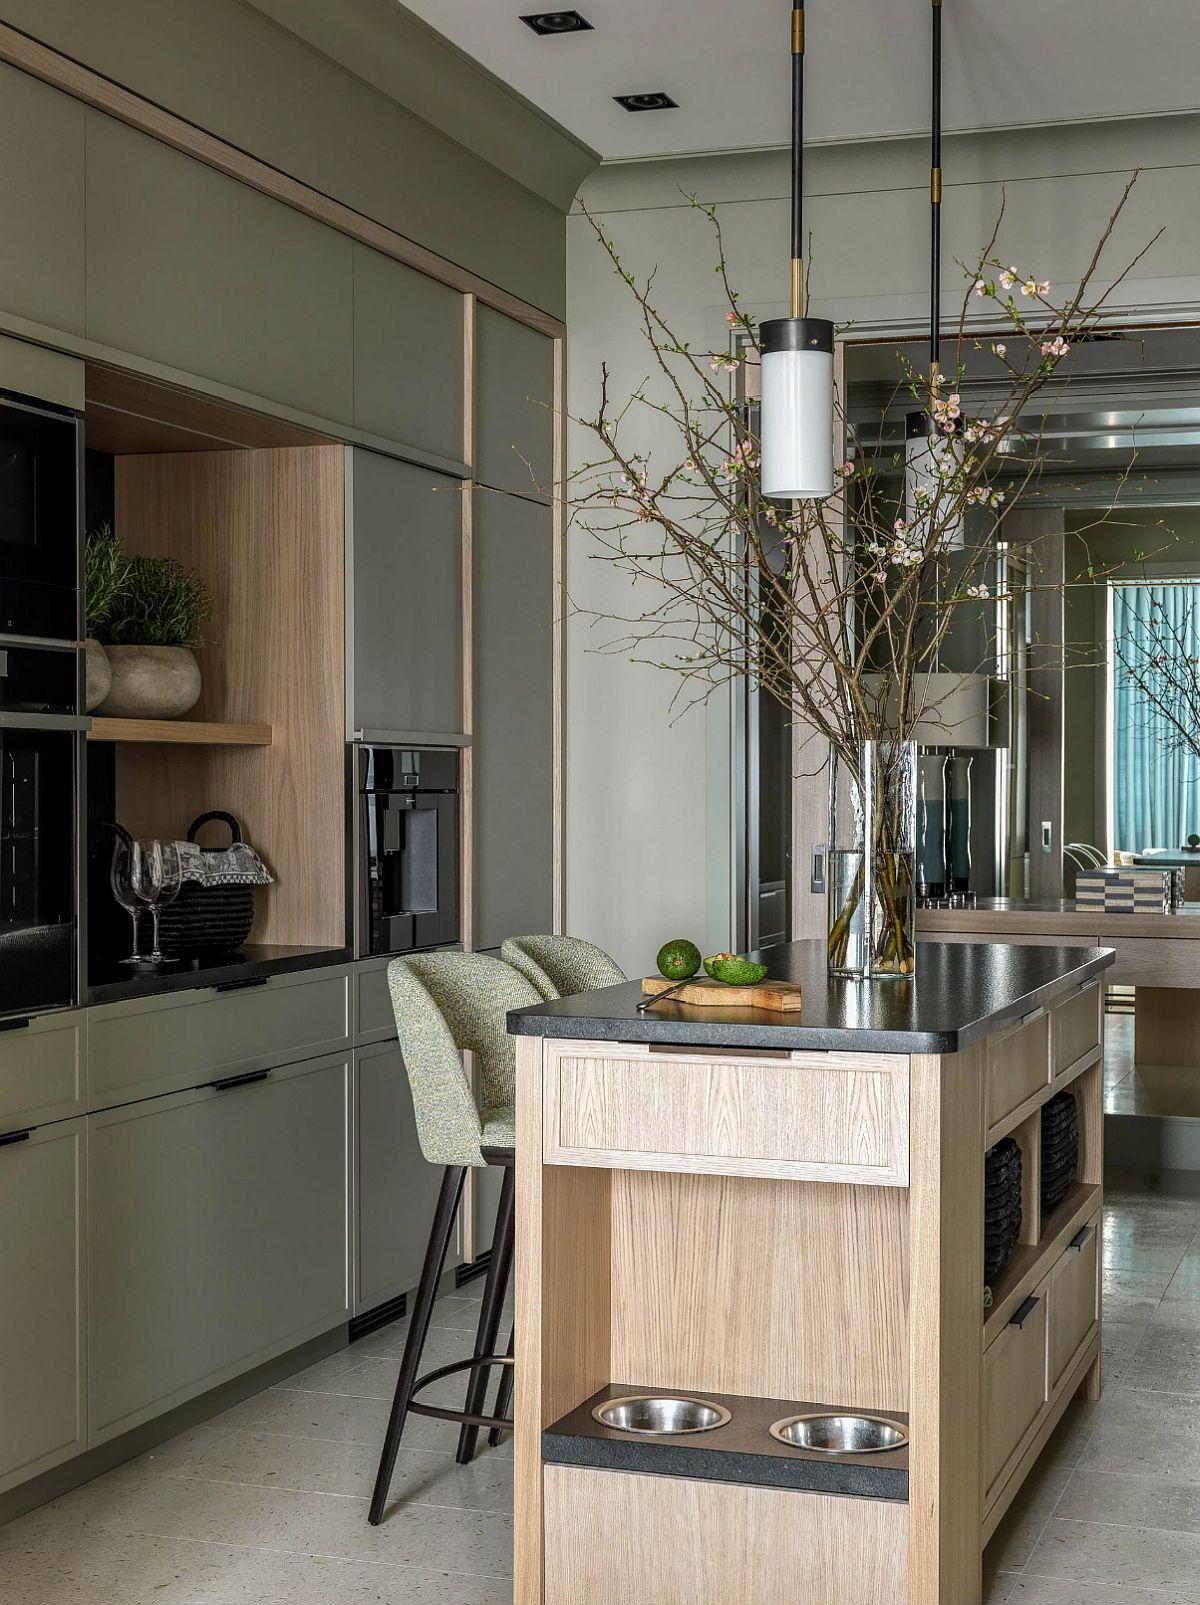 adelaparvu.com despre apartament 196 mp, designer Anna Pavlovskaya, Foto Serghei Krasyuk (39)